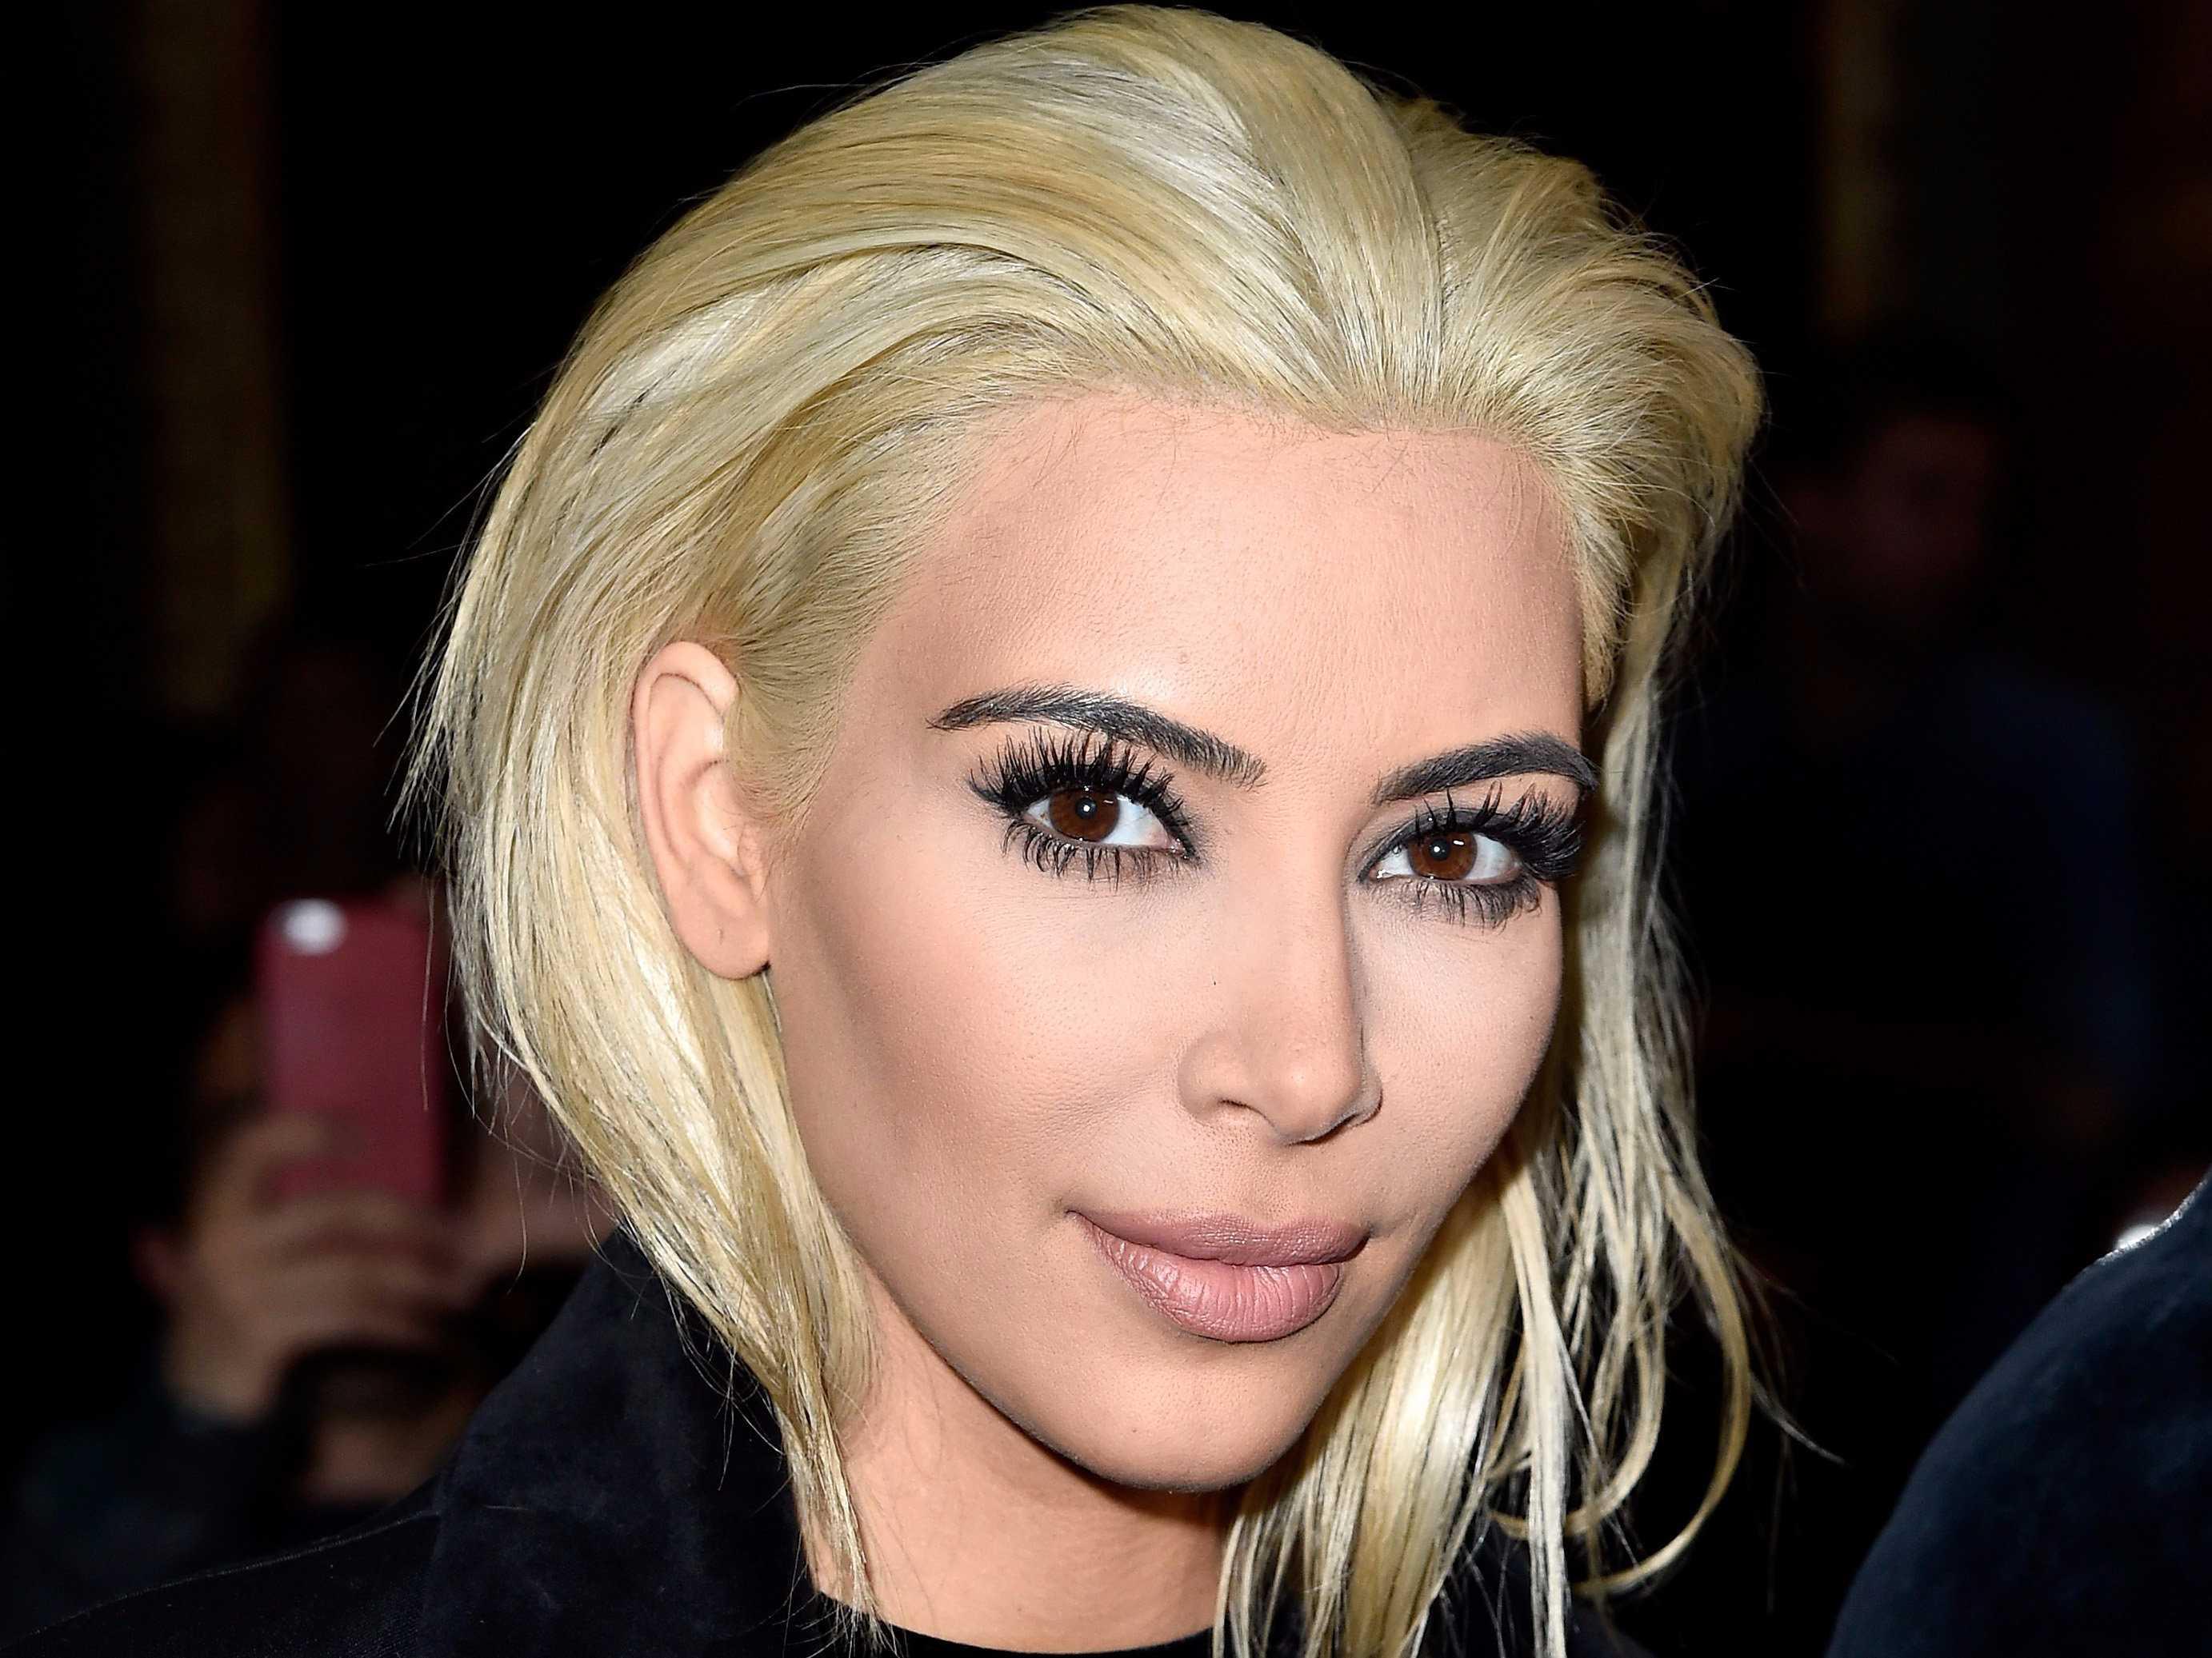 Katy Perry Is Stone-Faced While Posing Next to Kim Kardashian, Kanye West in Paris